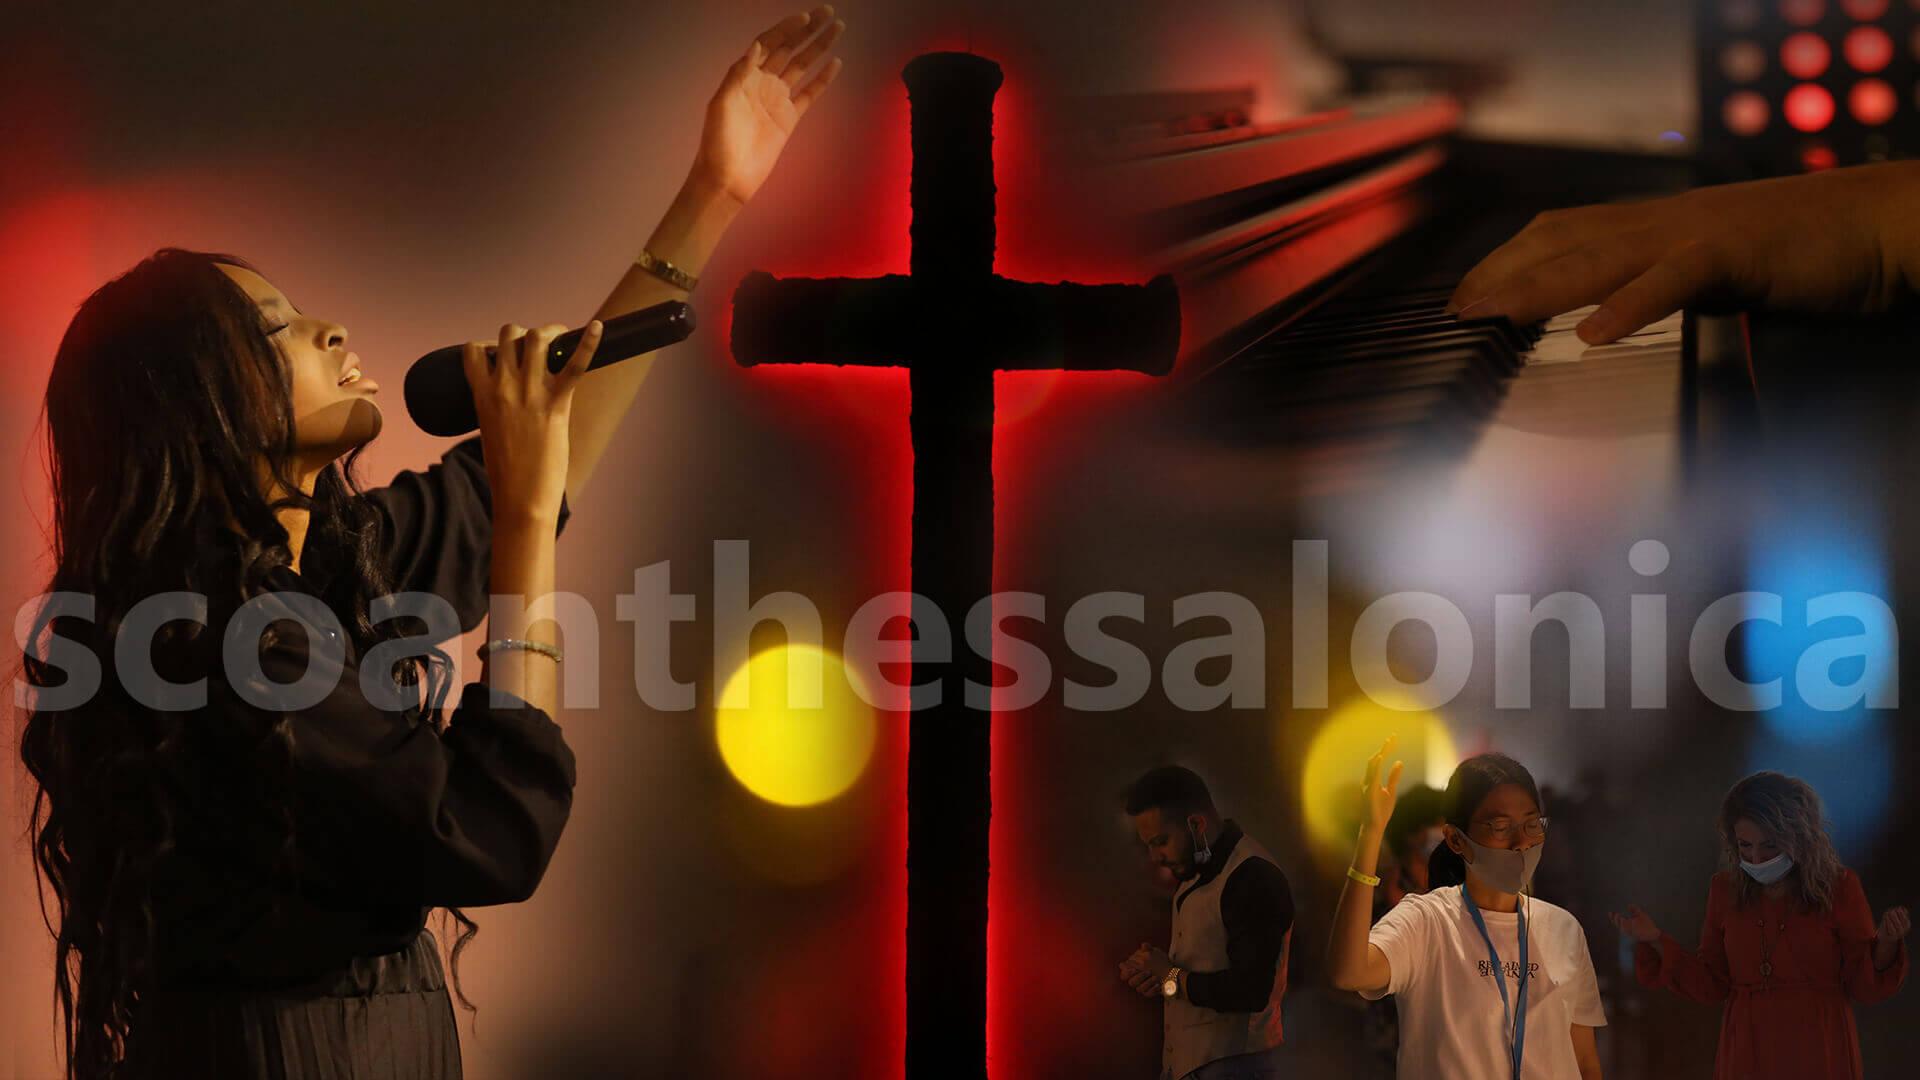 SCOAN_THESSALONICA_WORSHIP_2020_10_11